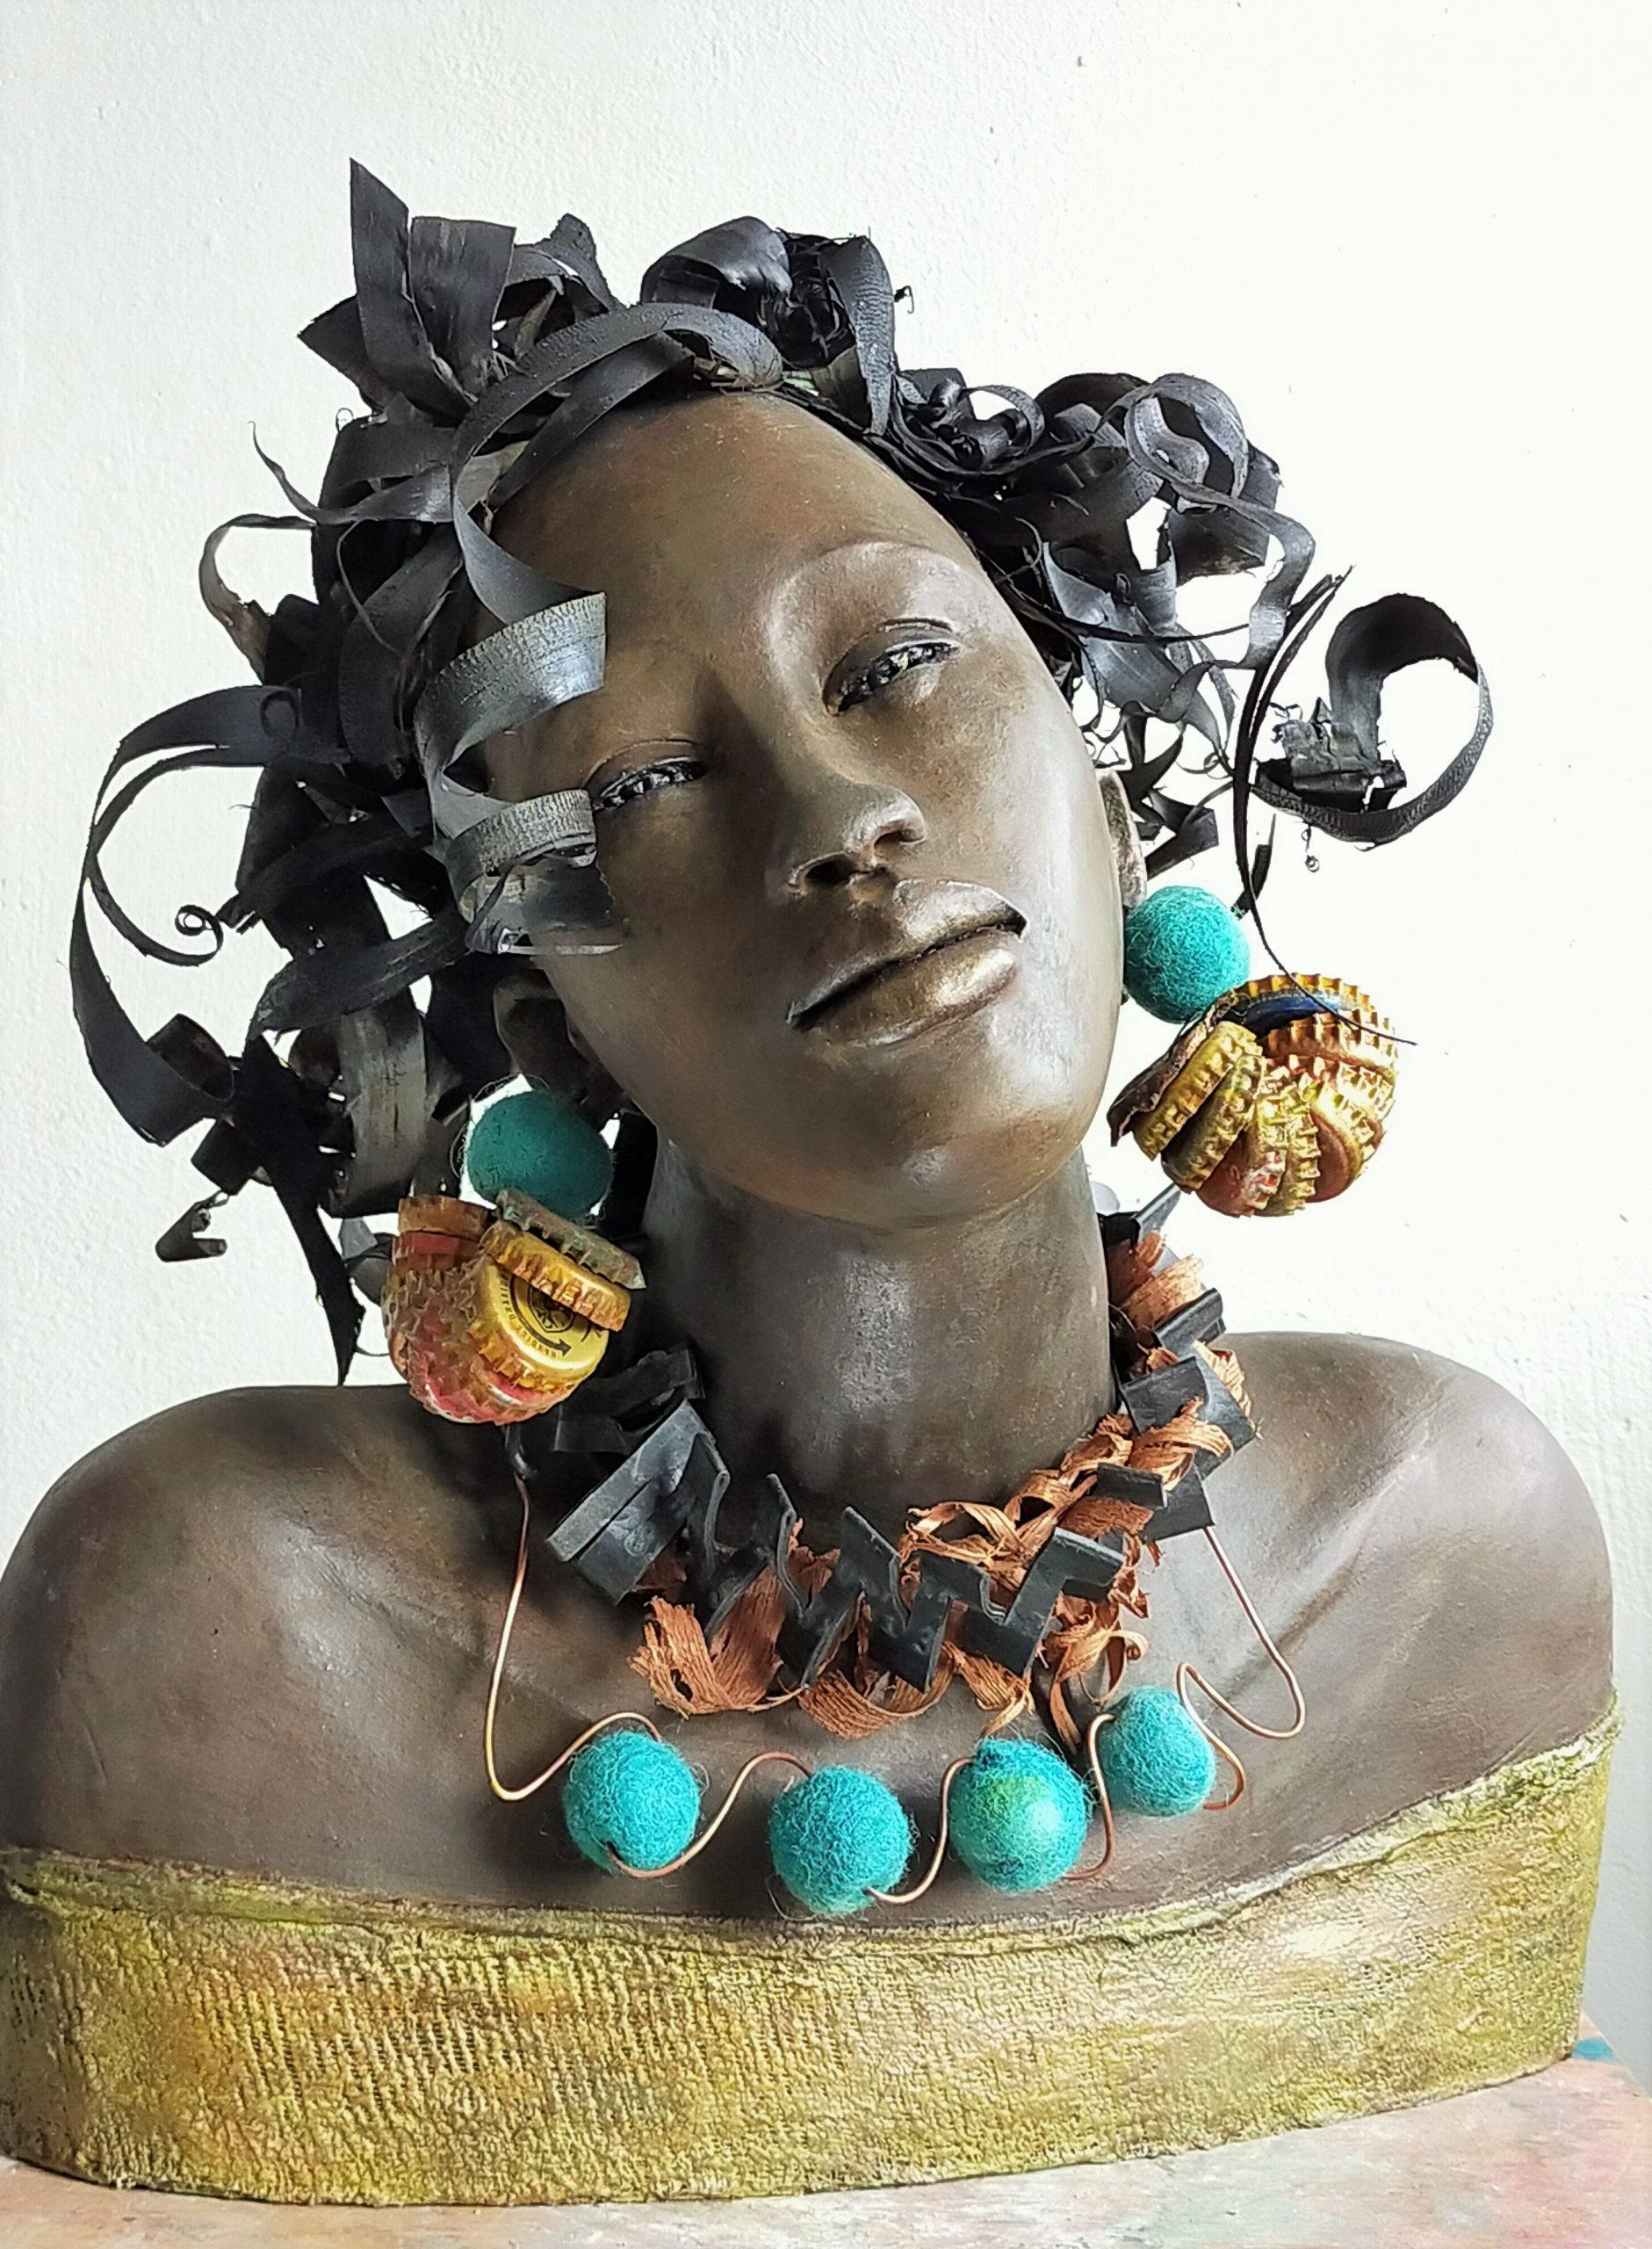 Kunst: Yipada – Turn van kunstenaar Lilian Wessels